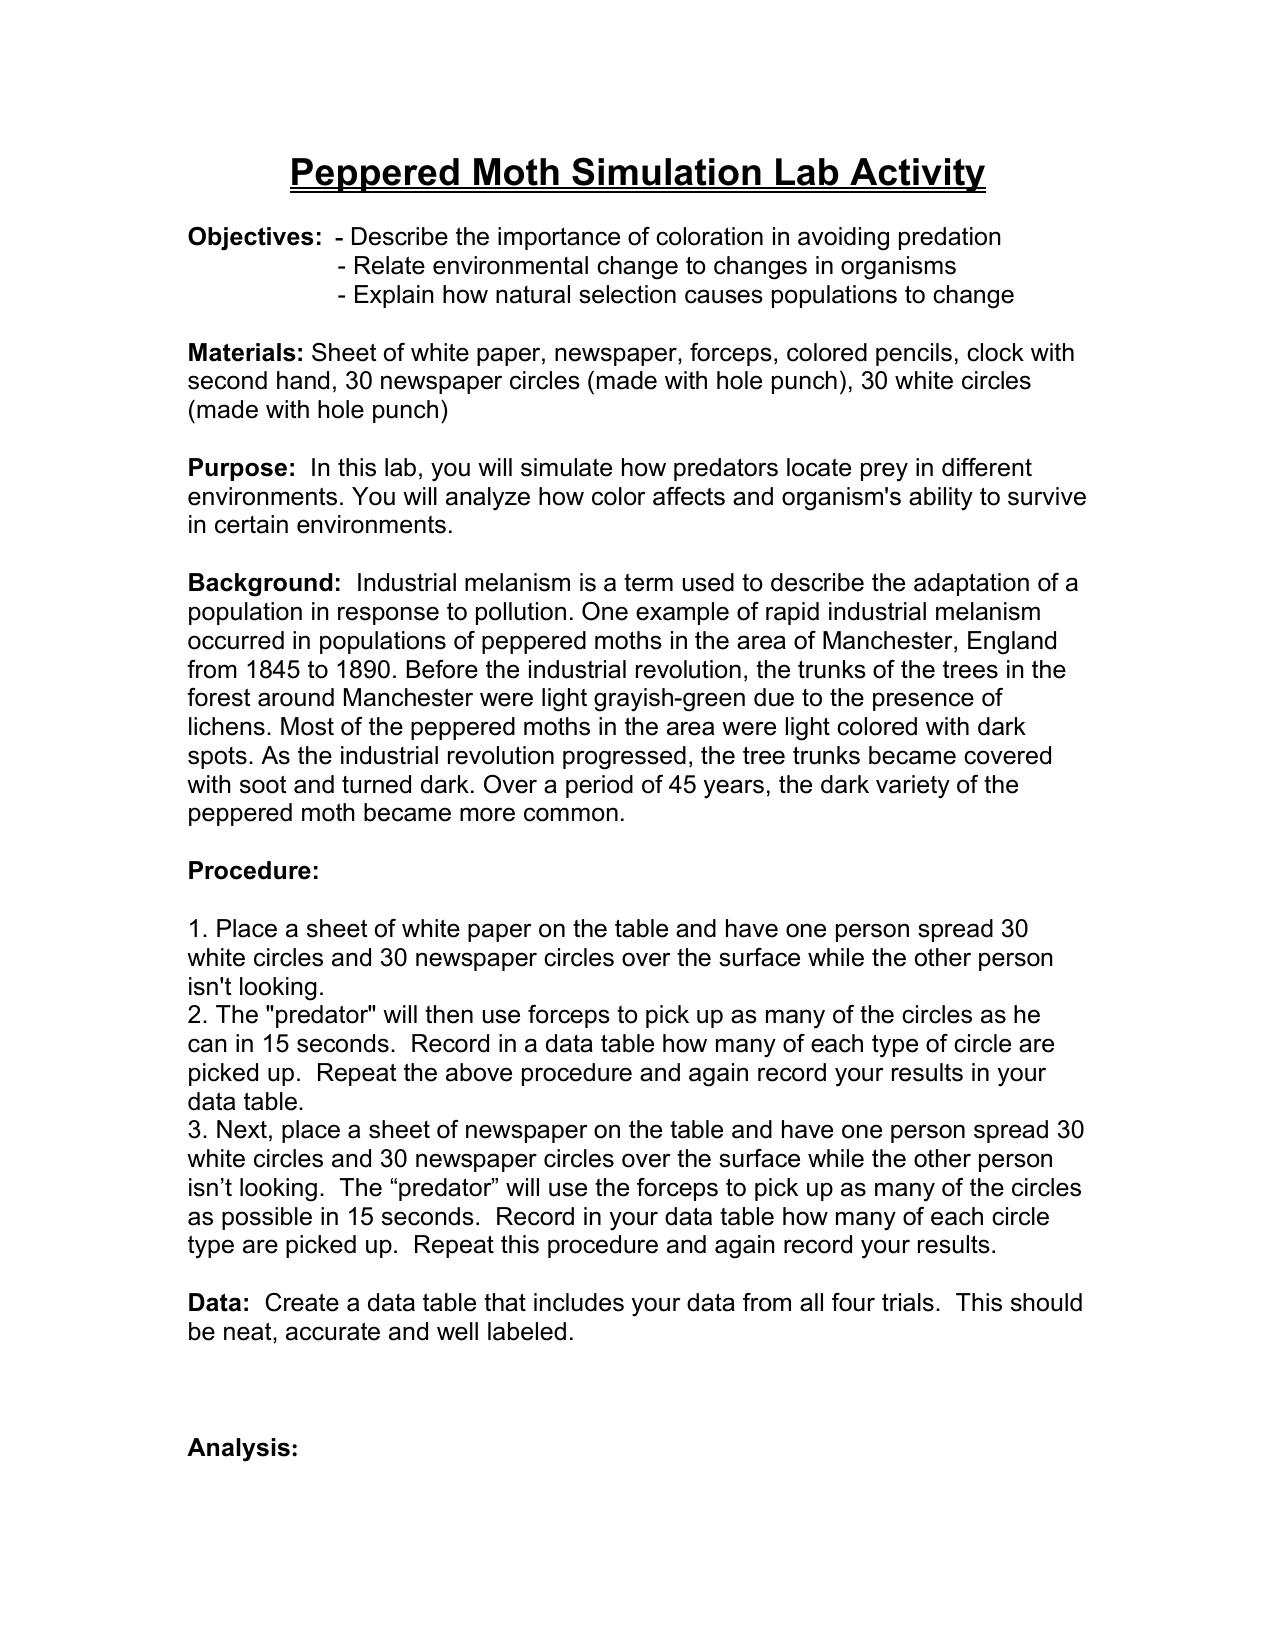 Peppered Moth Paper Lab – Peppered Moth Worksheet